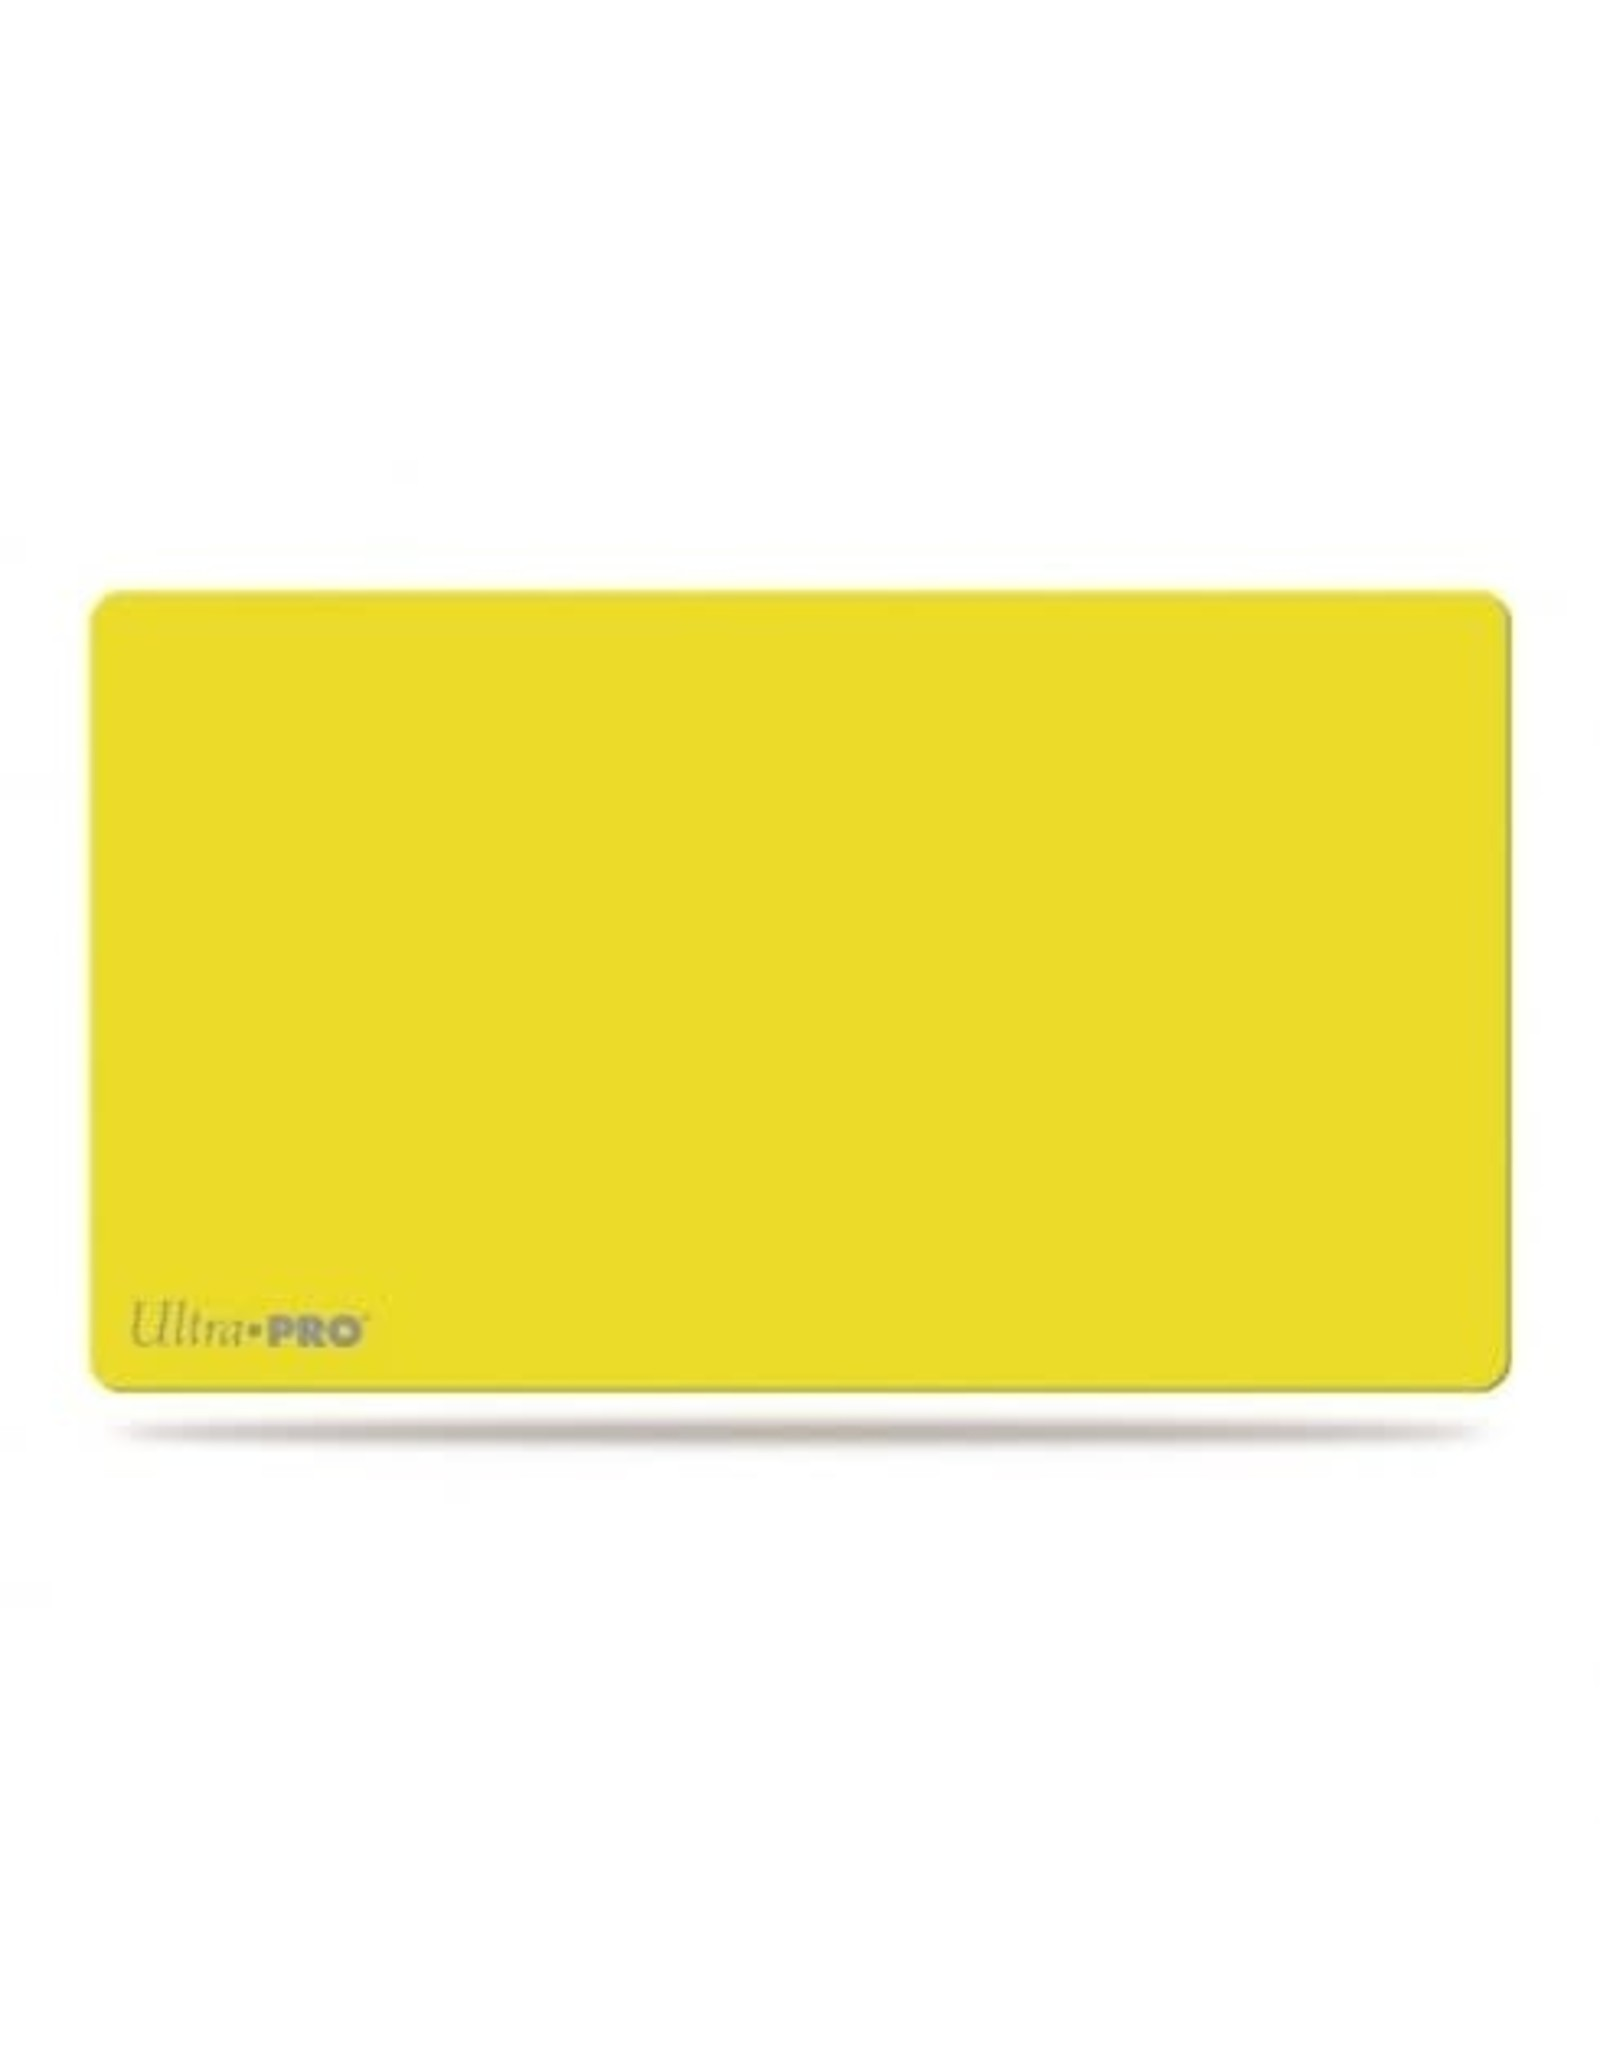 Ultra Pro Ultra Pro Artist Playmat: Solid Yellow